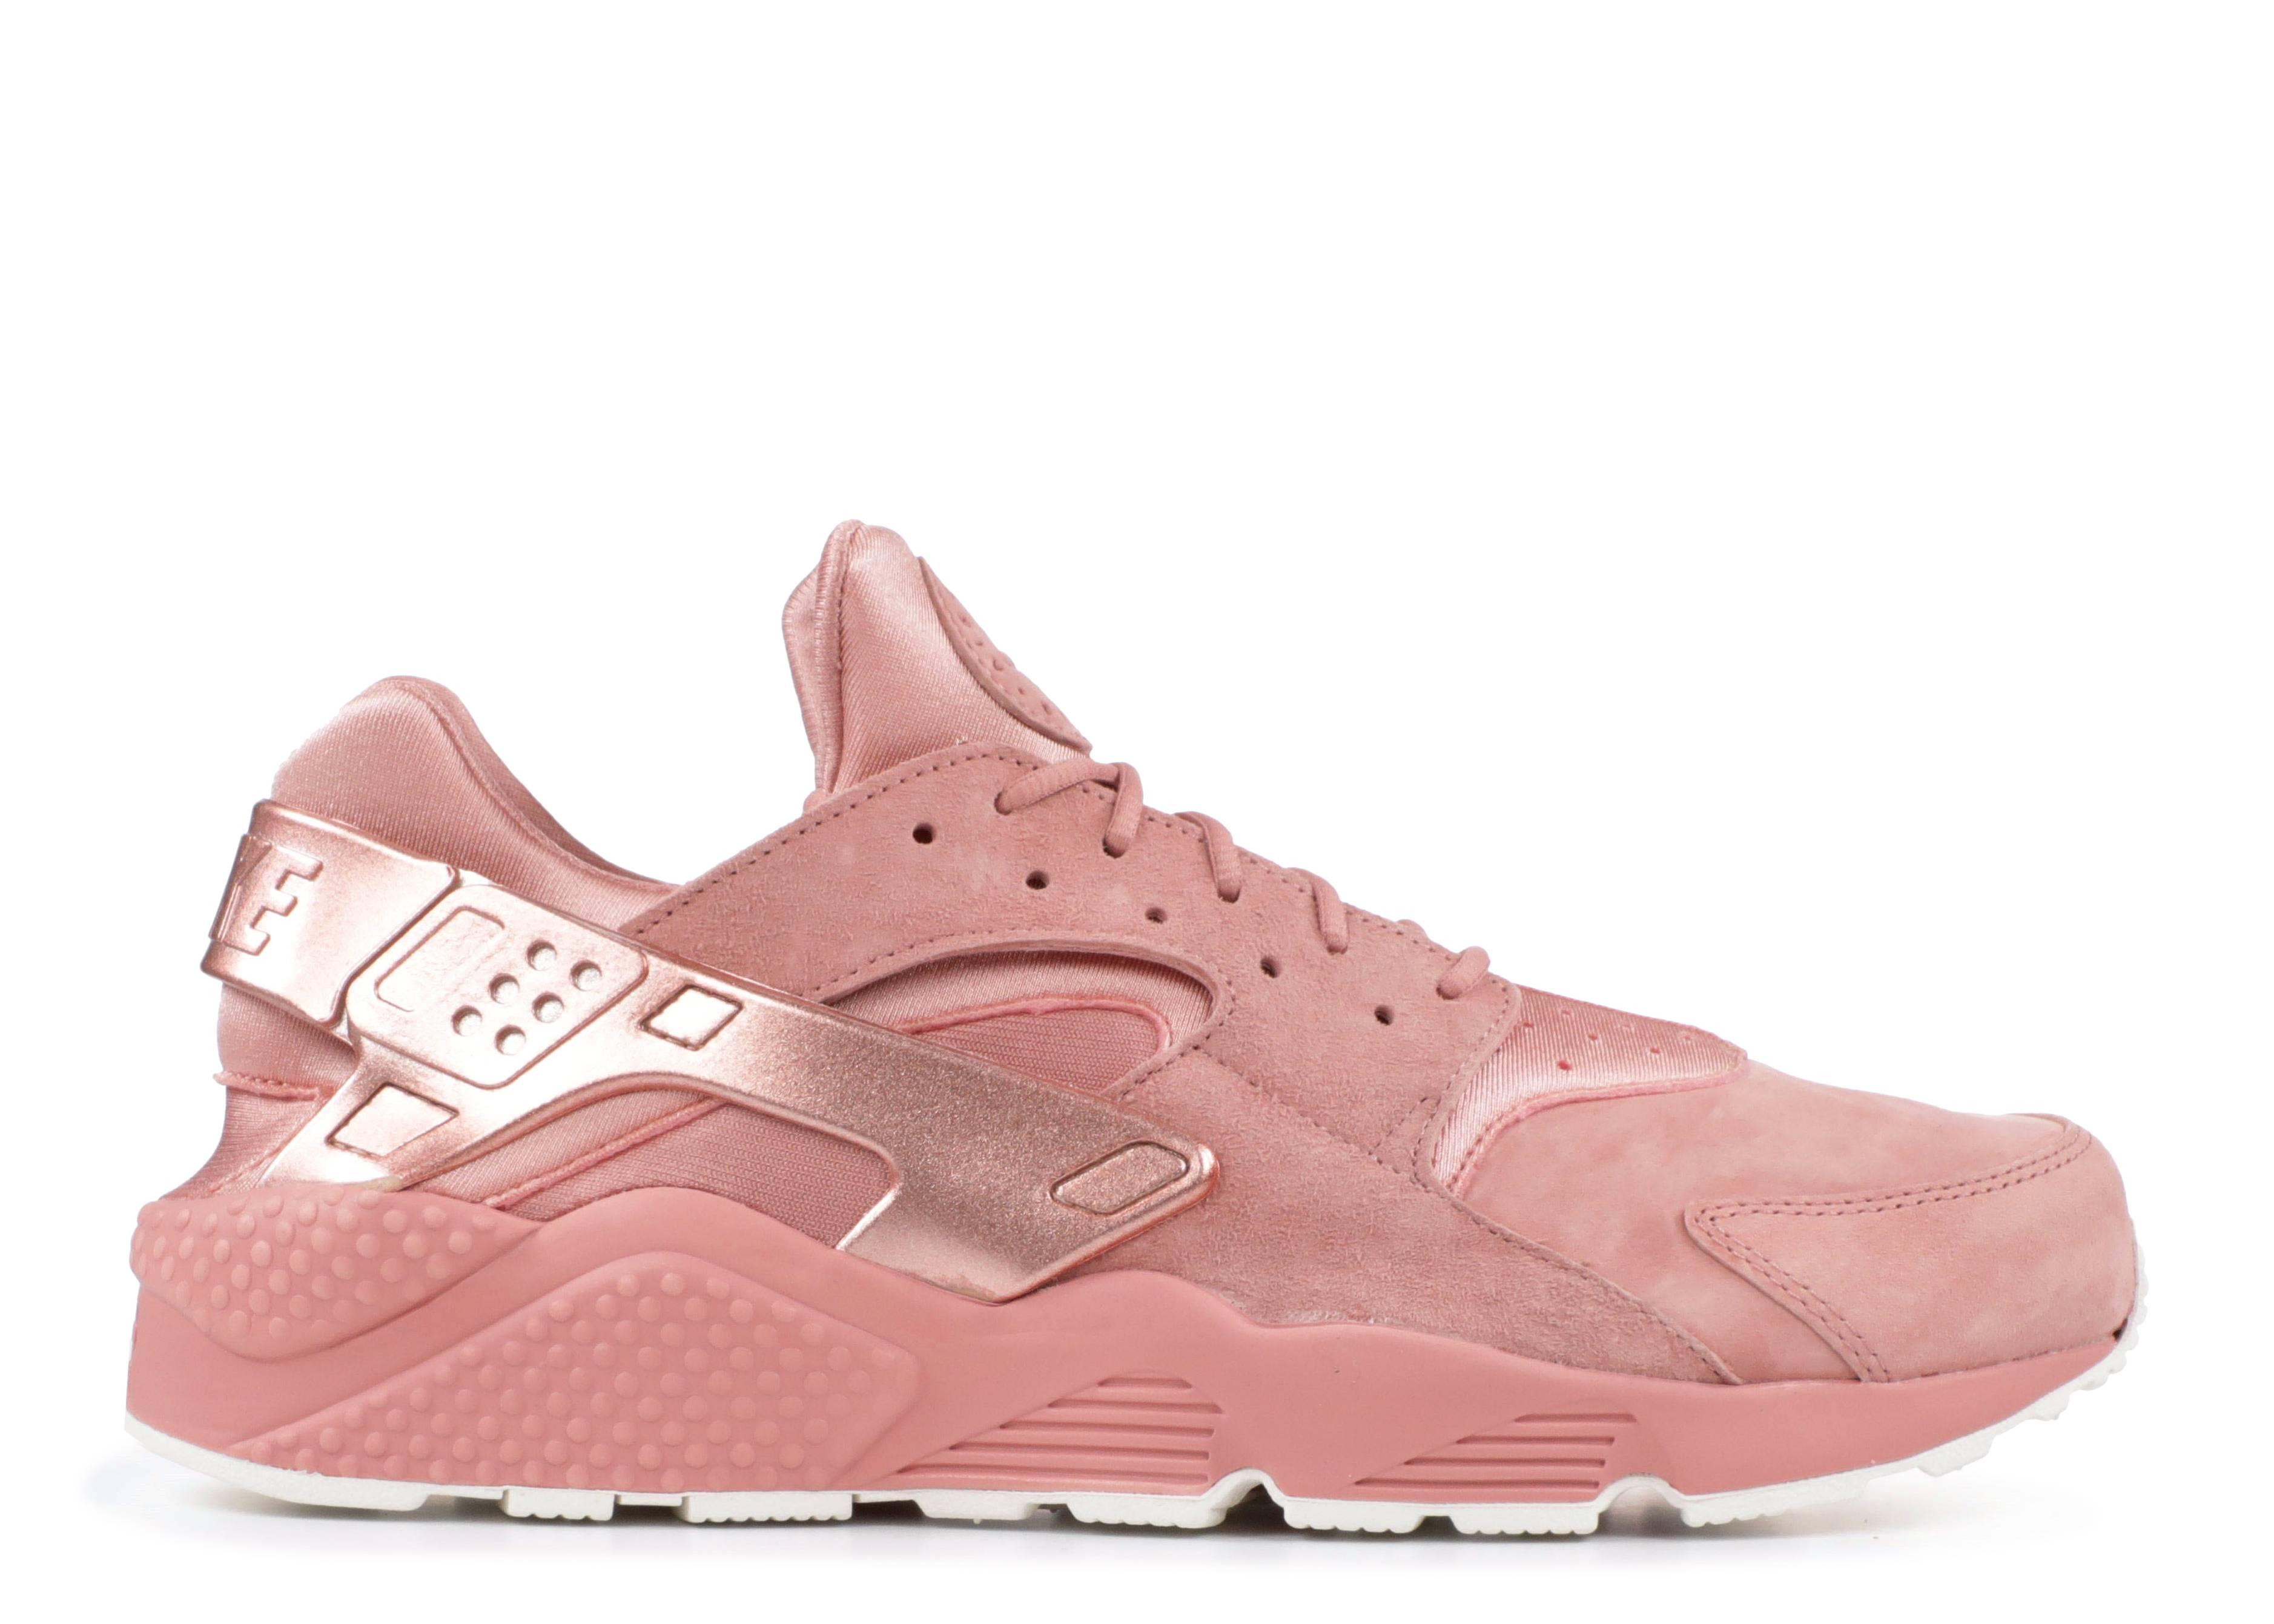 Nike Air Huarache Run Prm - Nike - 704830 601 - rust pink mtlc red ... 253793204e